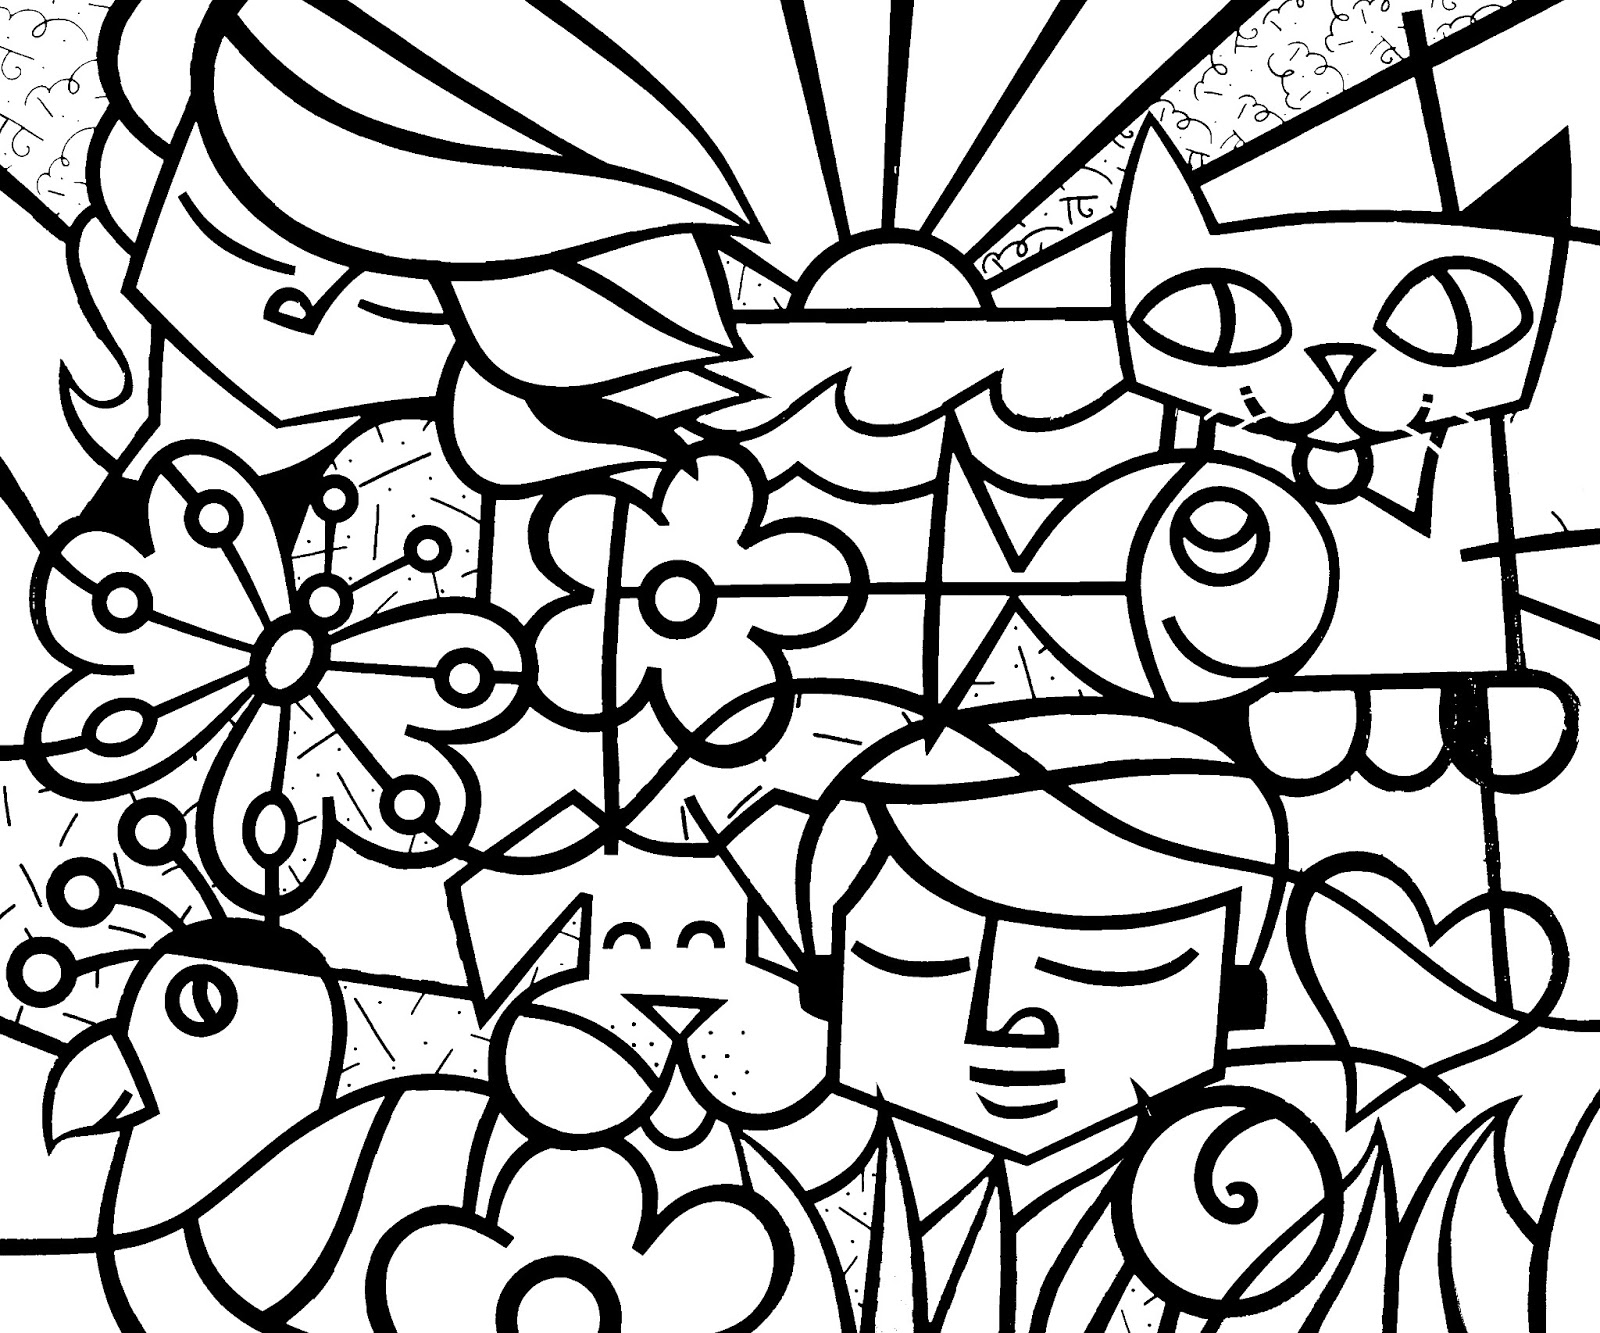 roberto romero coloring pages - photo#7